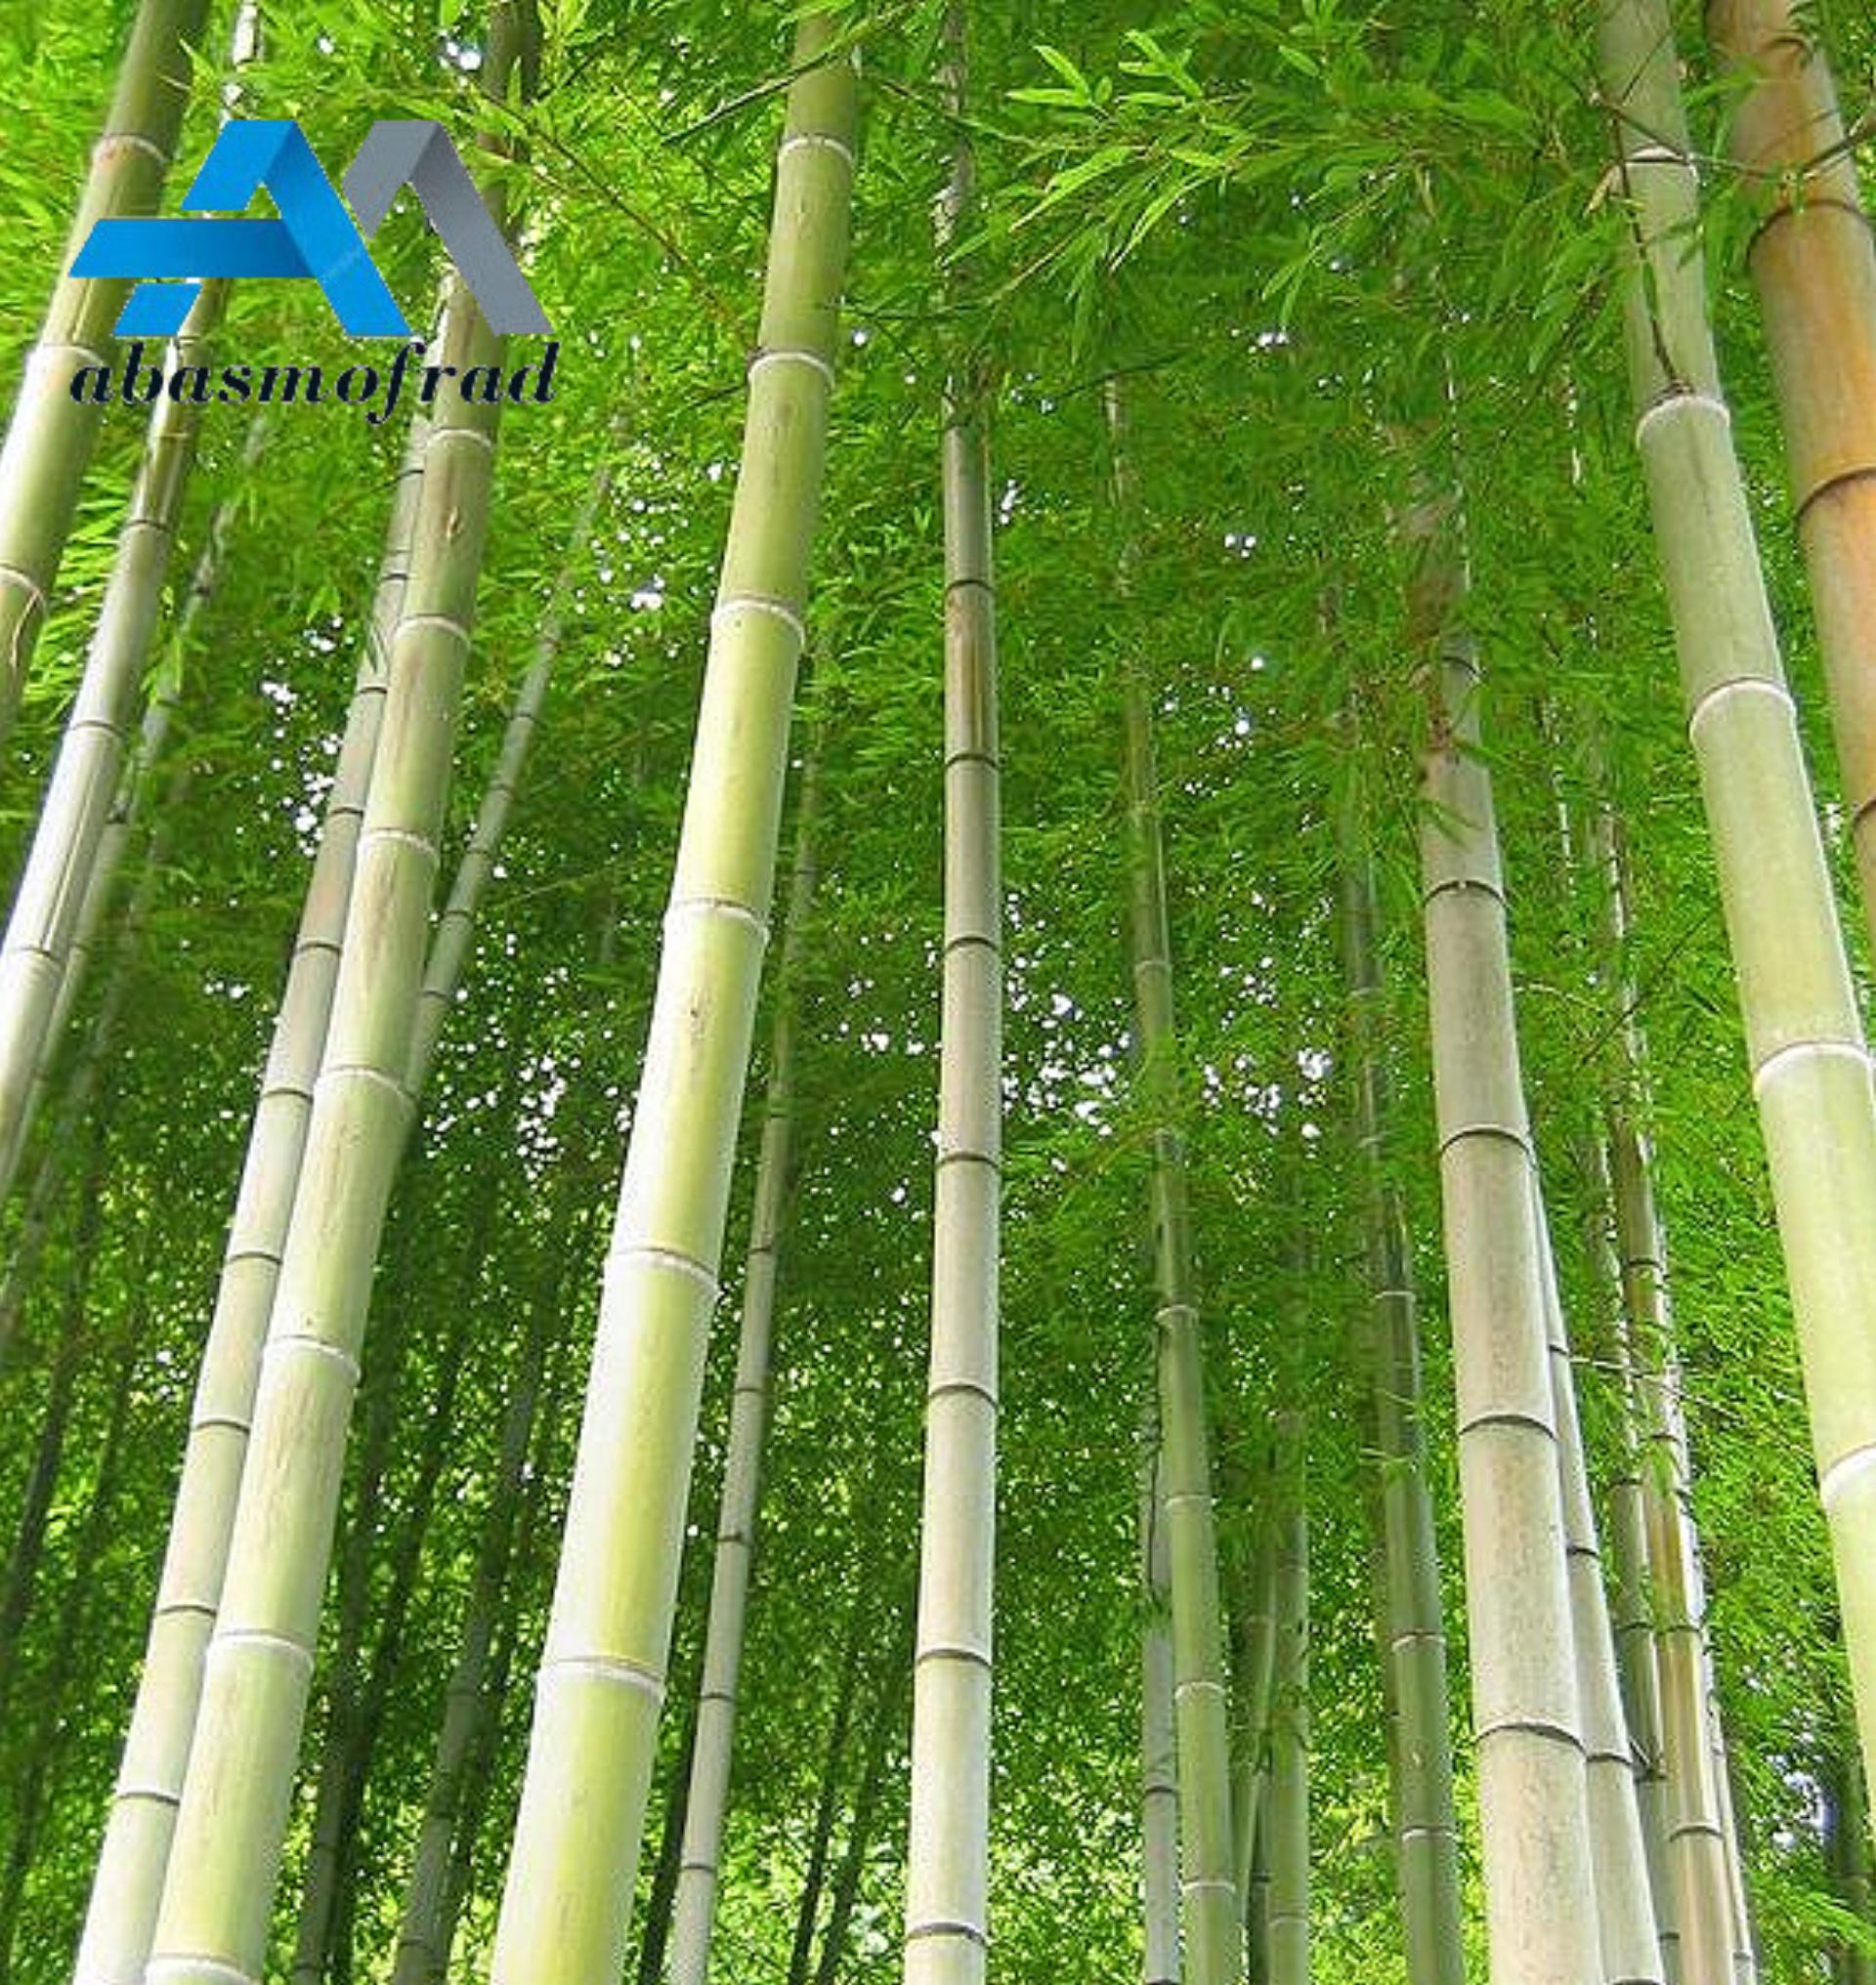 فروش عمده چوب بامبو